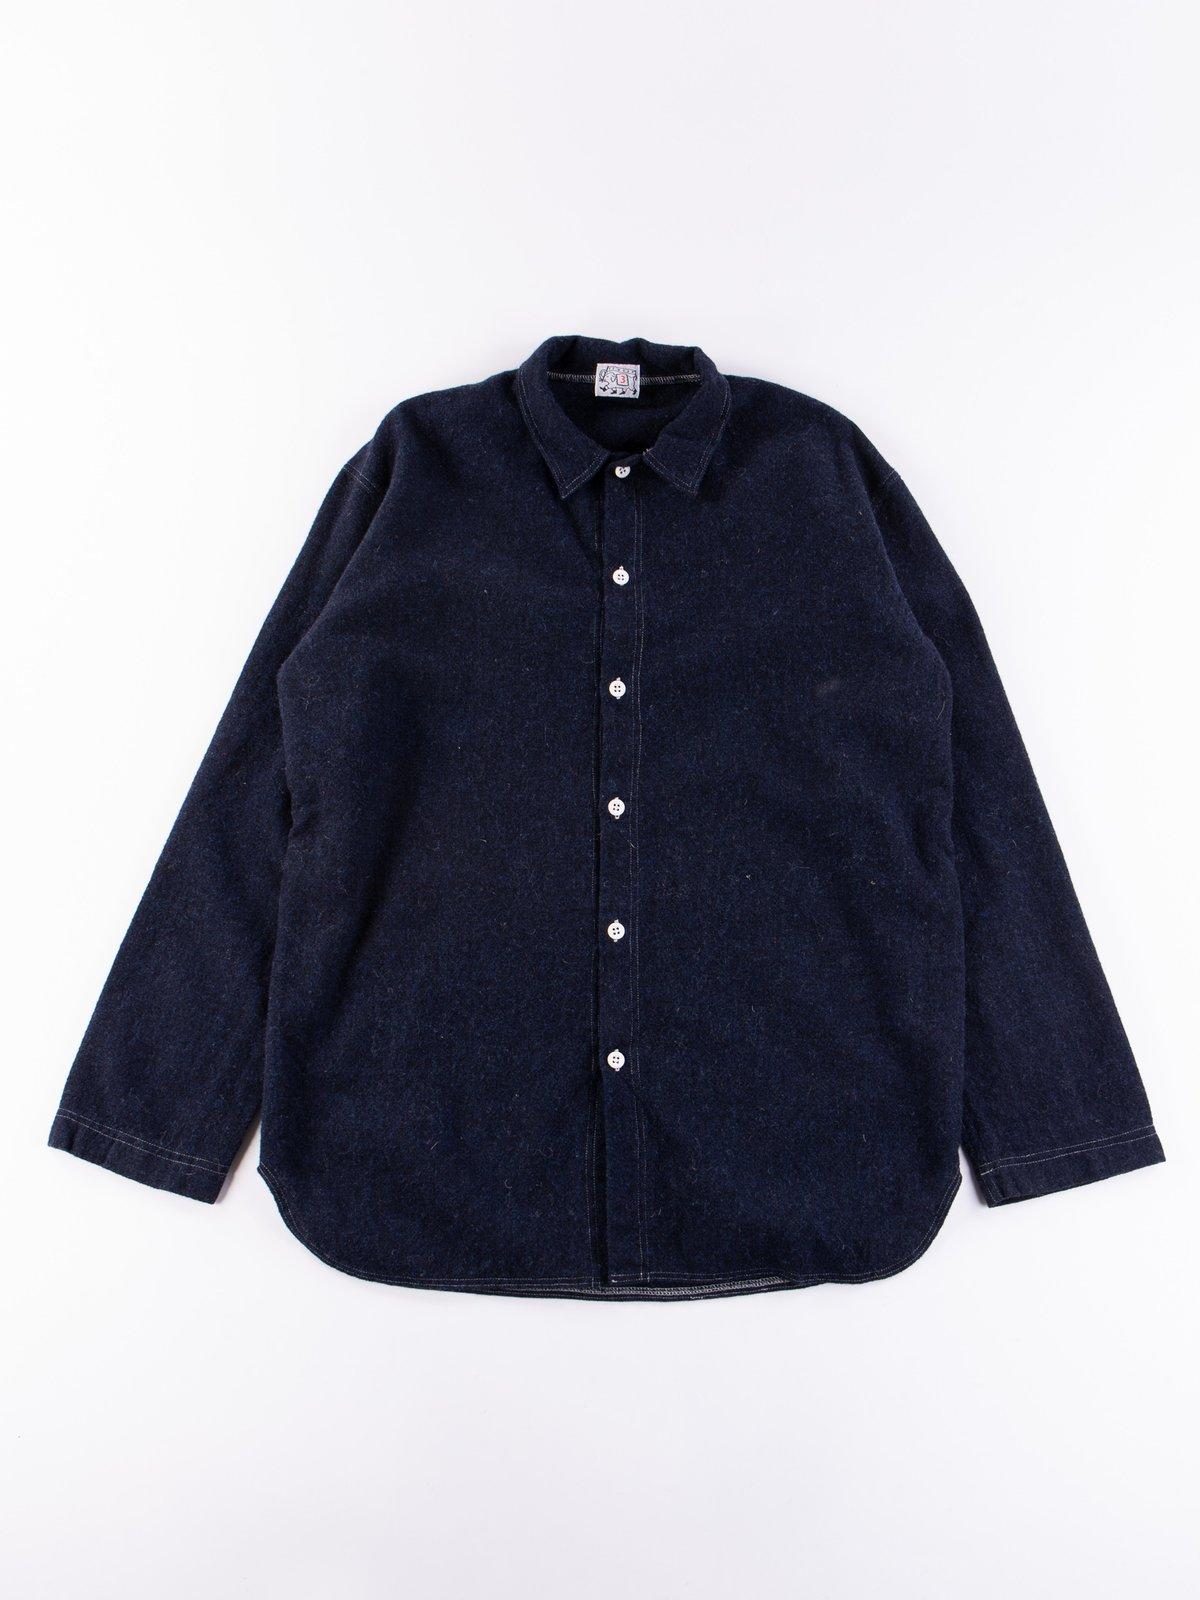 Navy Weavers Stock Tail Shirt - Image 1